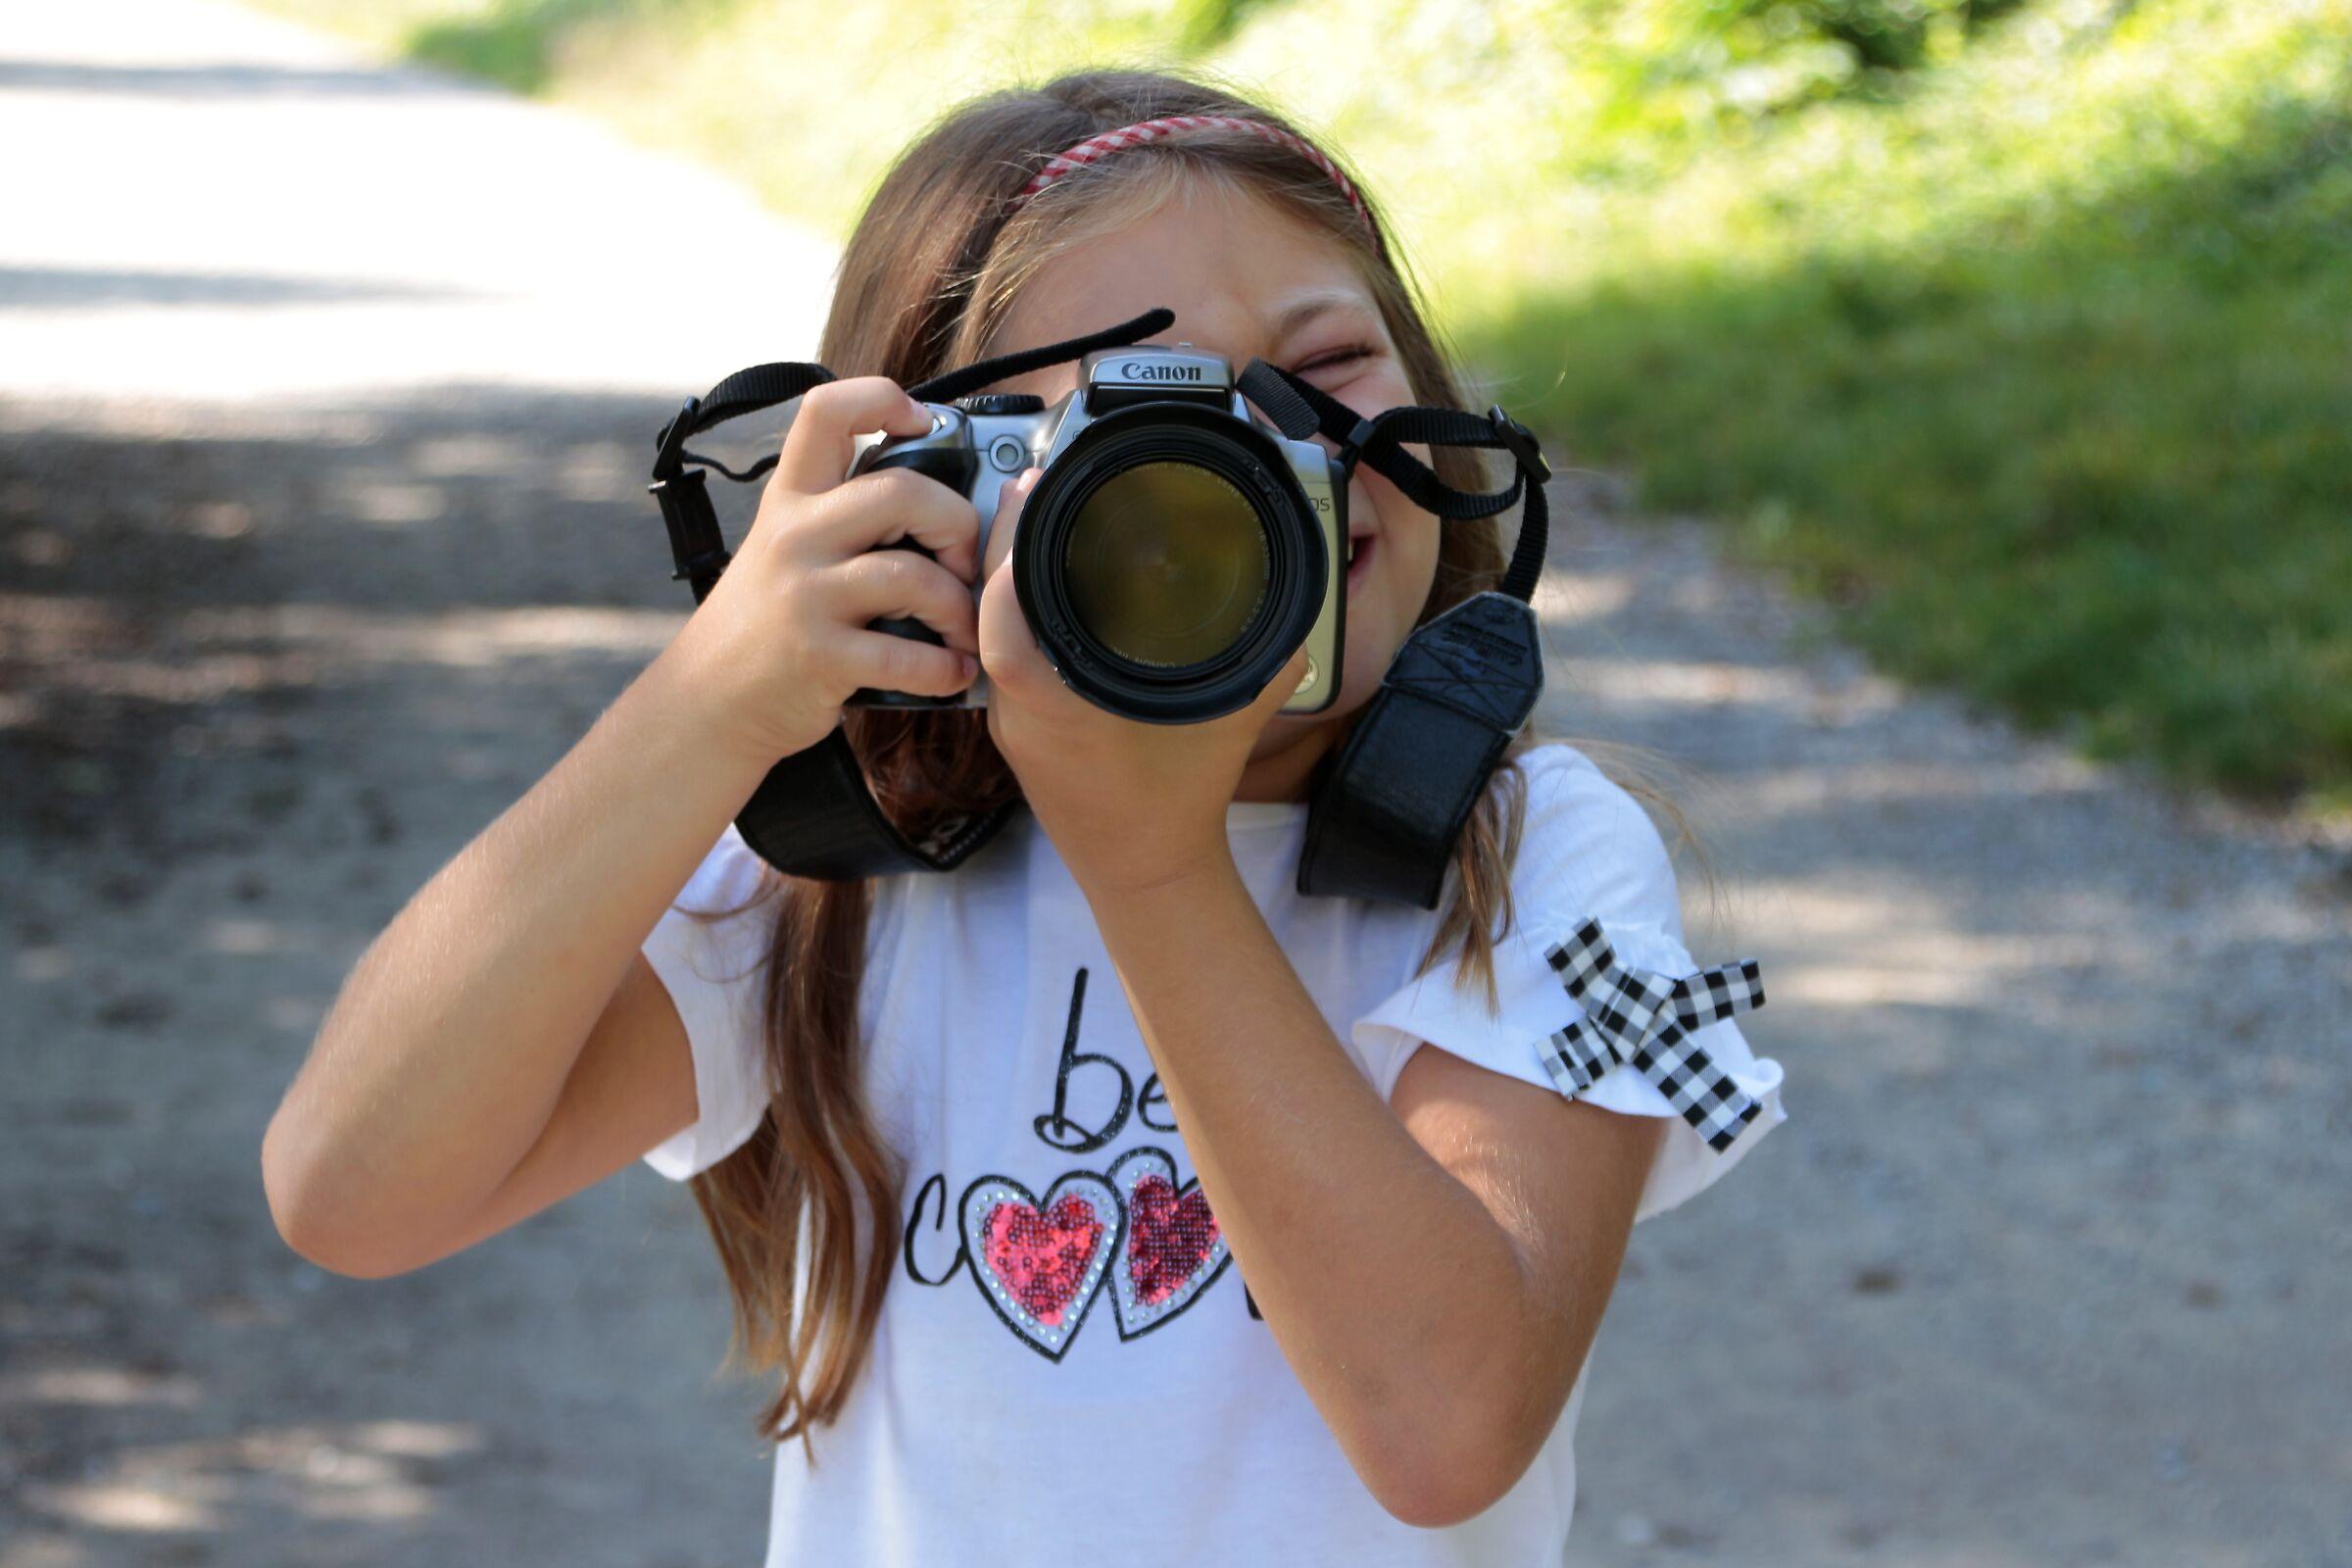 Small photographers grow up...